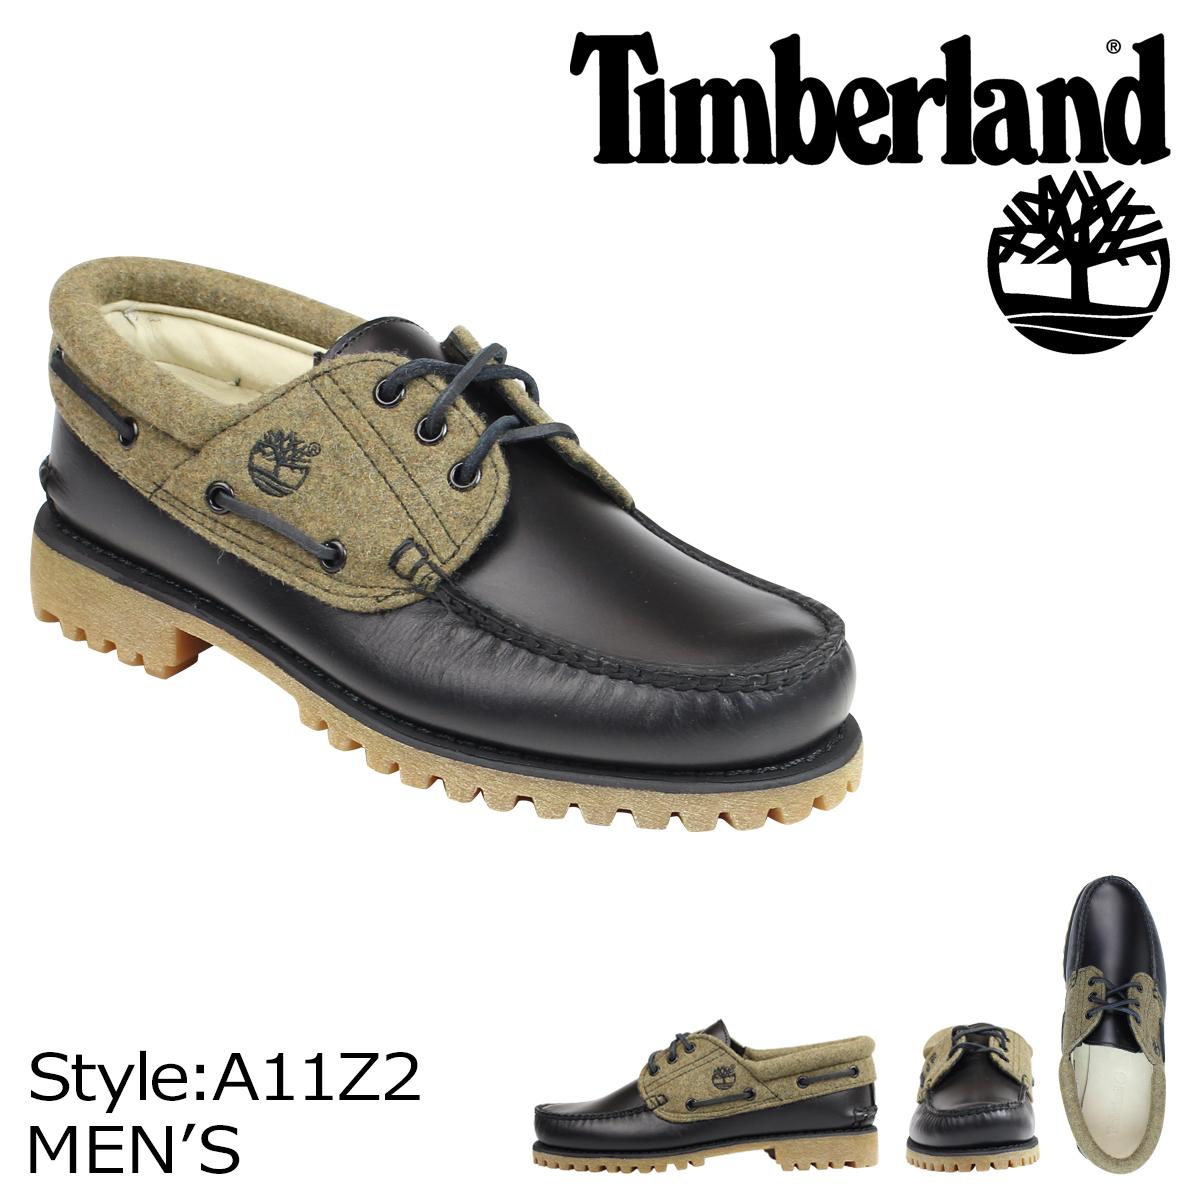 Timberland Authentics 3 Eye